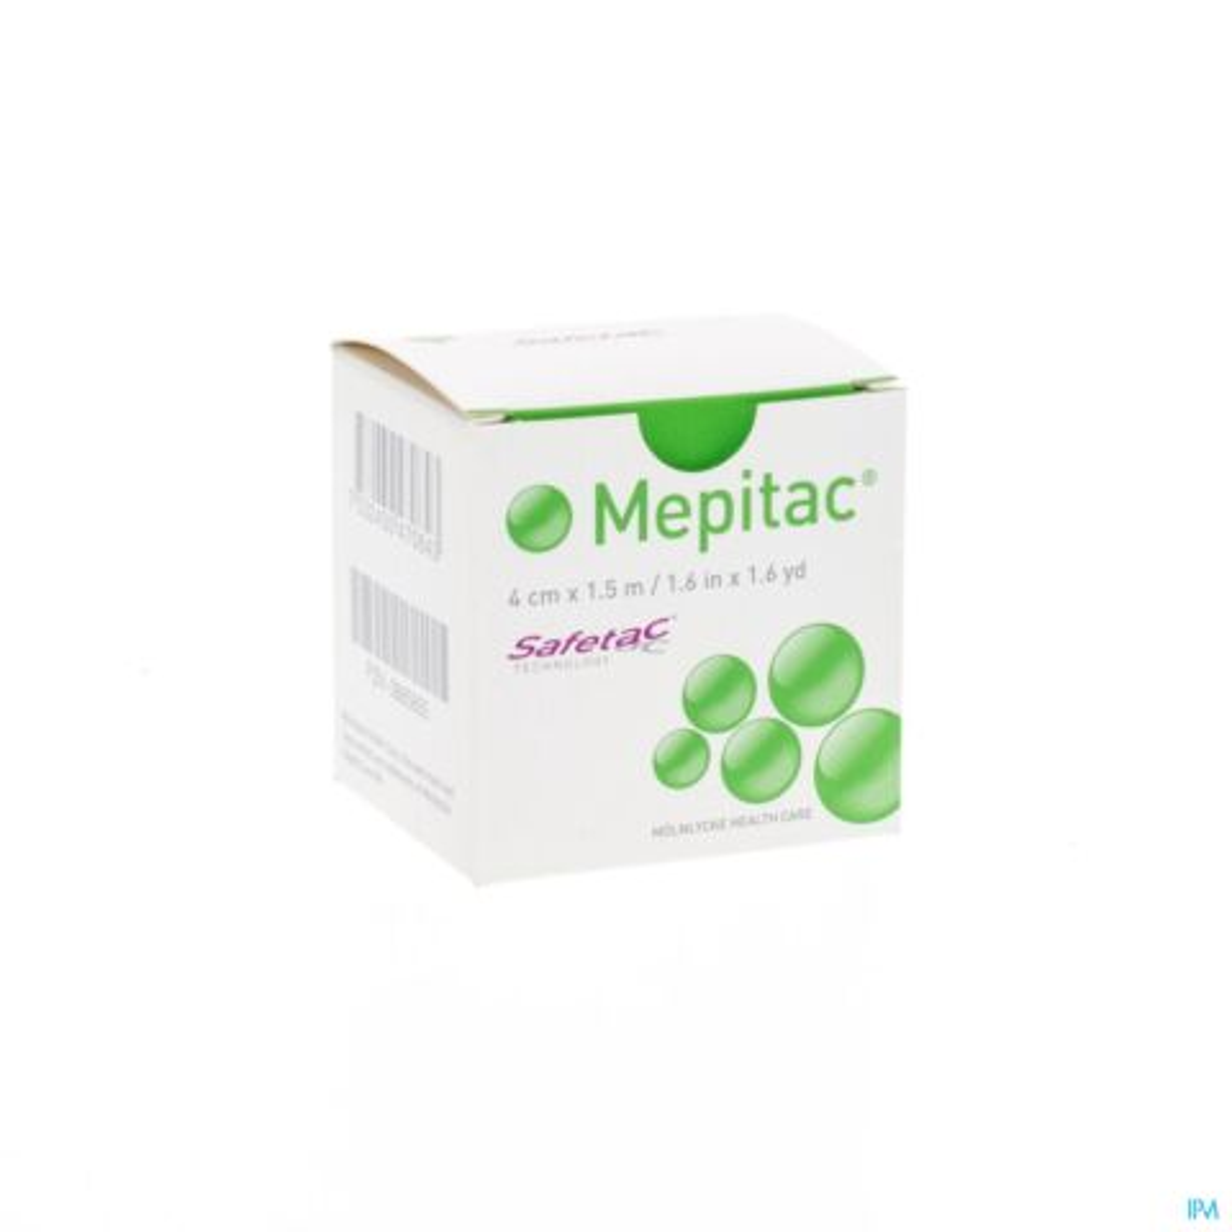 MEPITAC ZACHTE FIXATIETAPE SIL 4CMX1,5M 1 298400